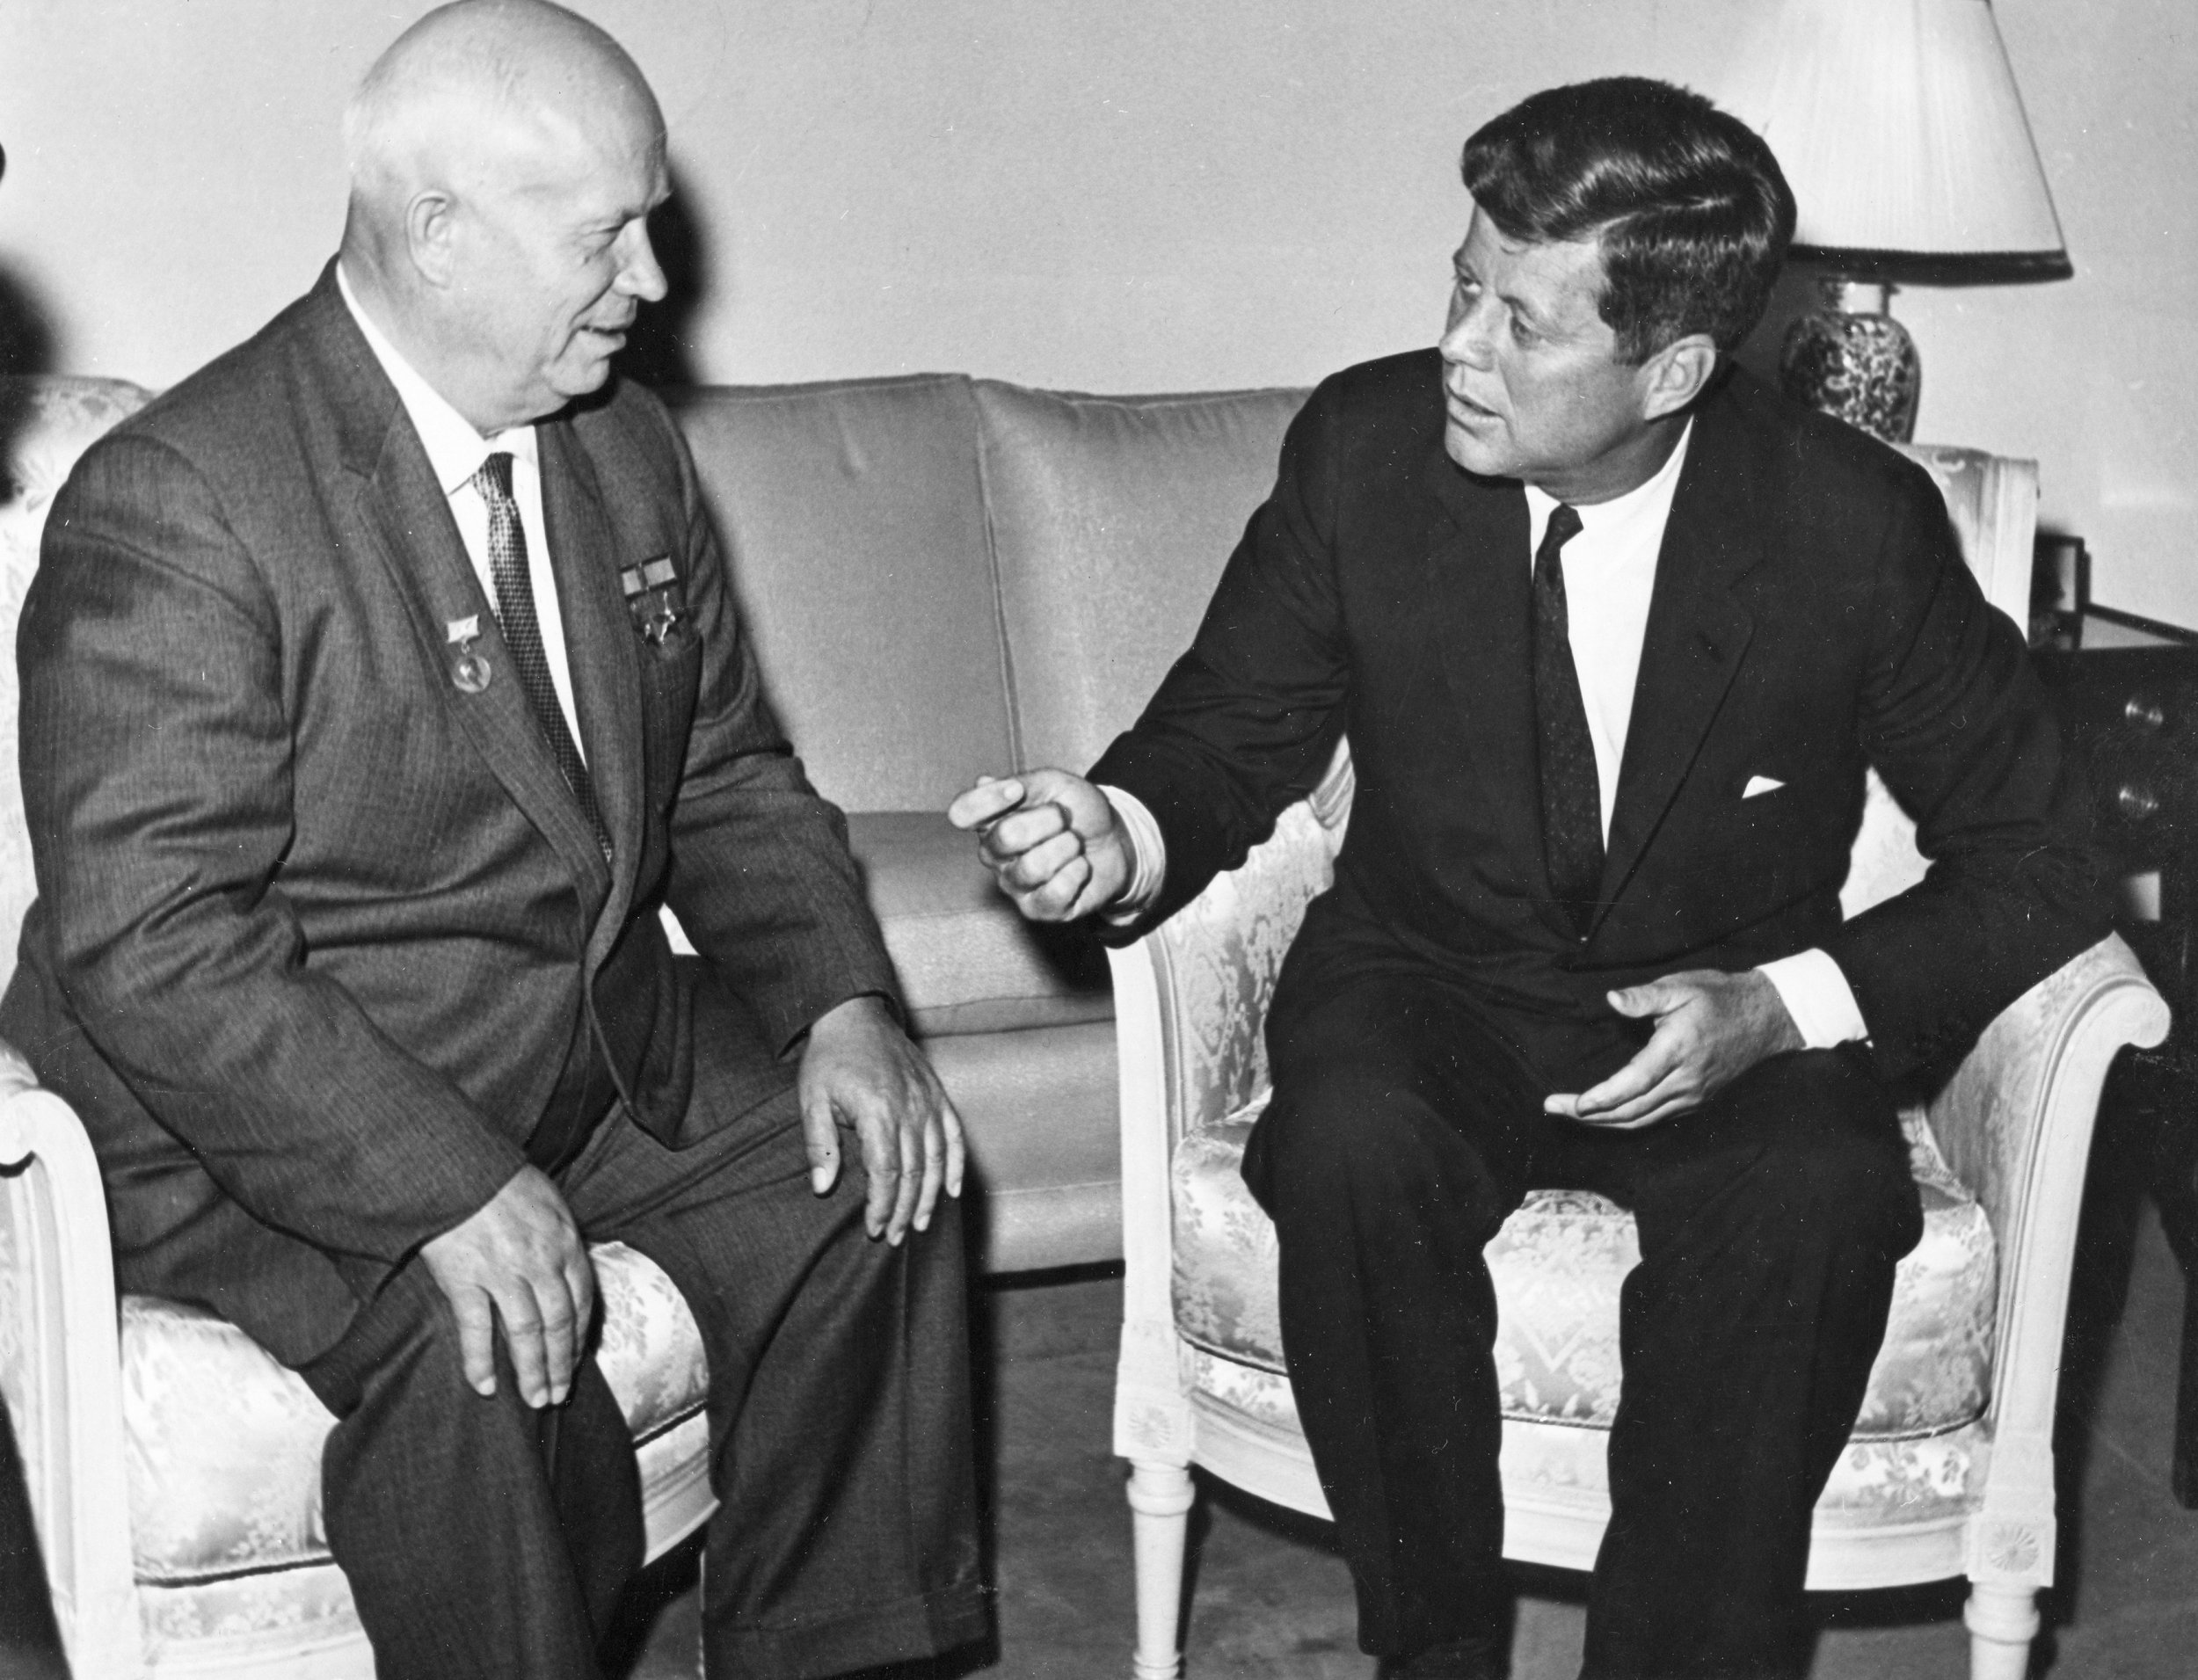 John F. Kennedy: World War II Naval Hero to President